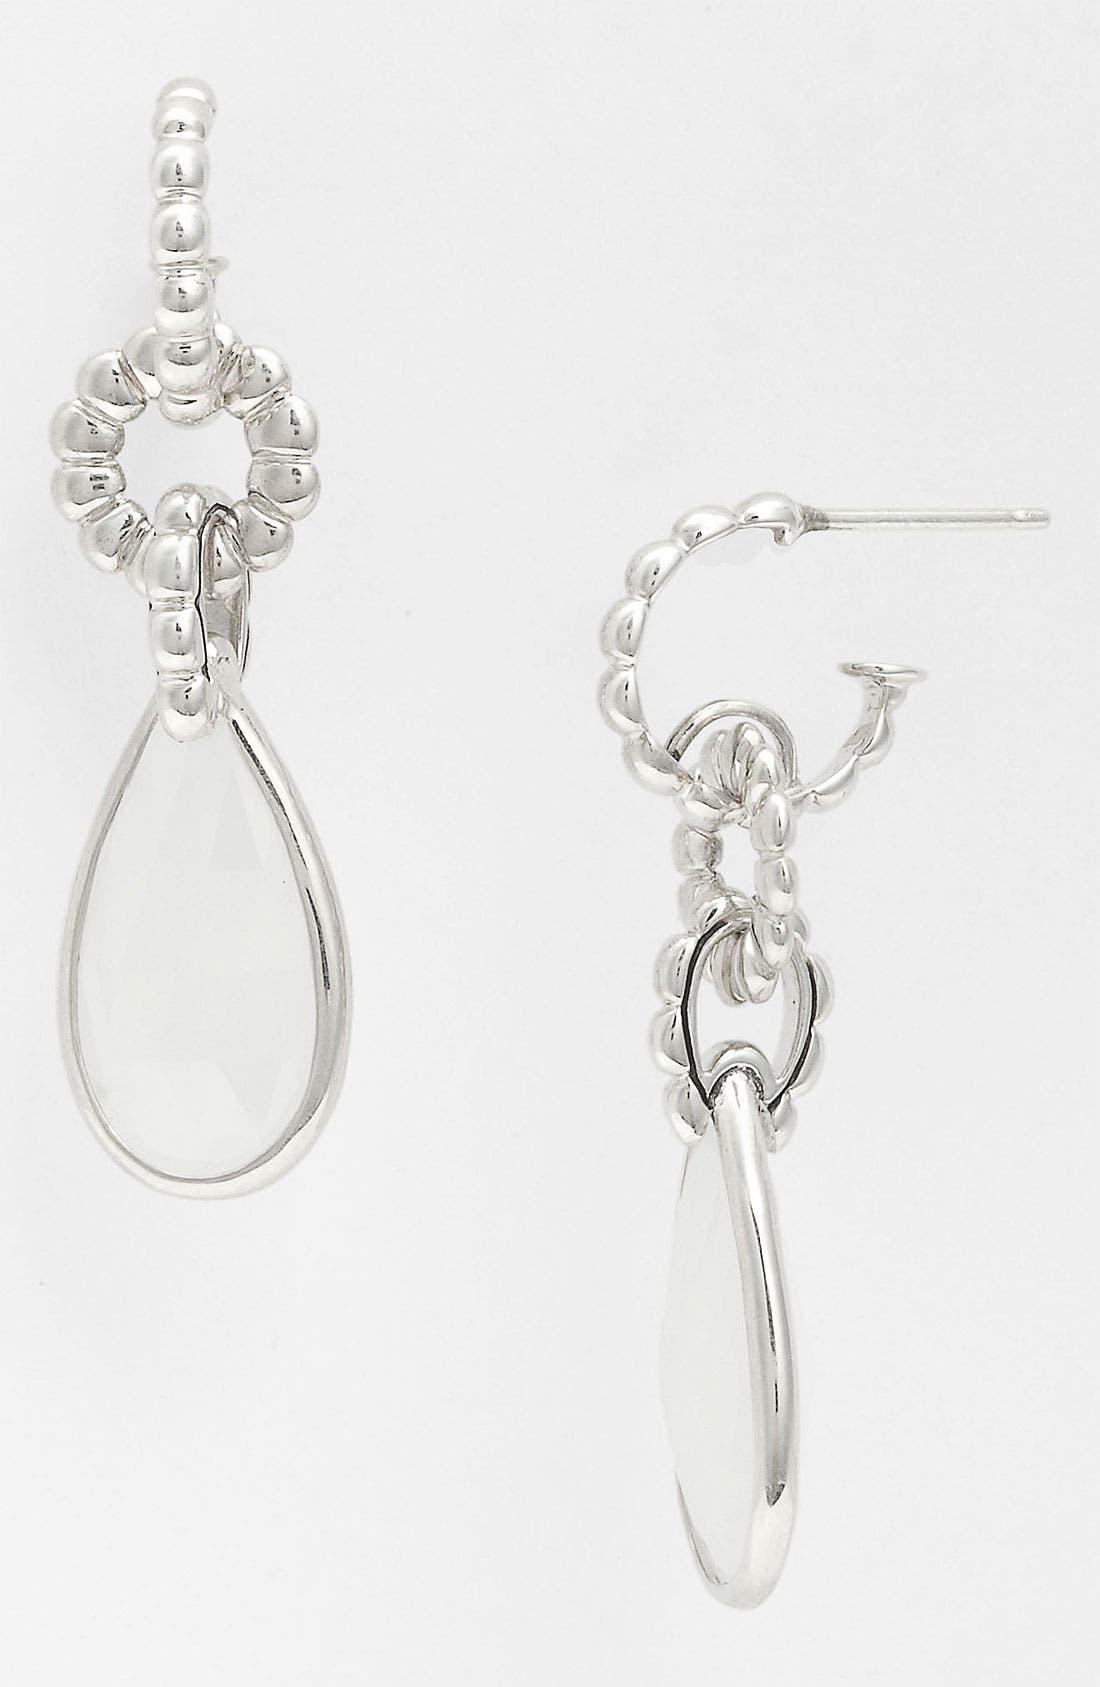 Main Image - John Hardy 'Bedeg' Small Stone Drop Earrings